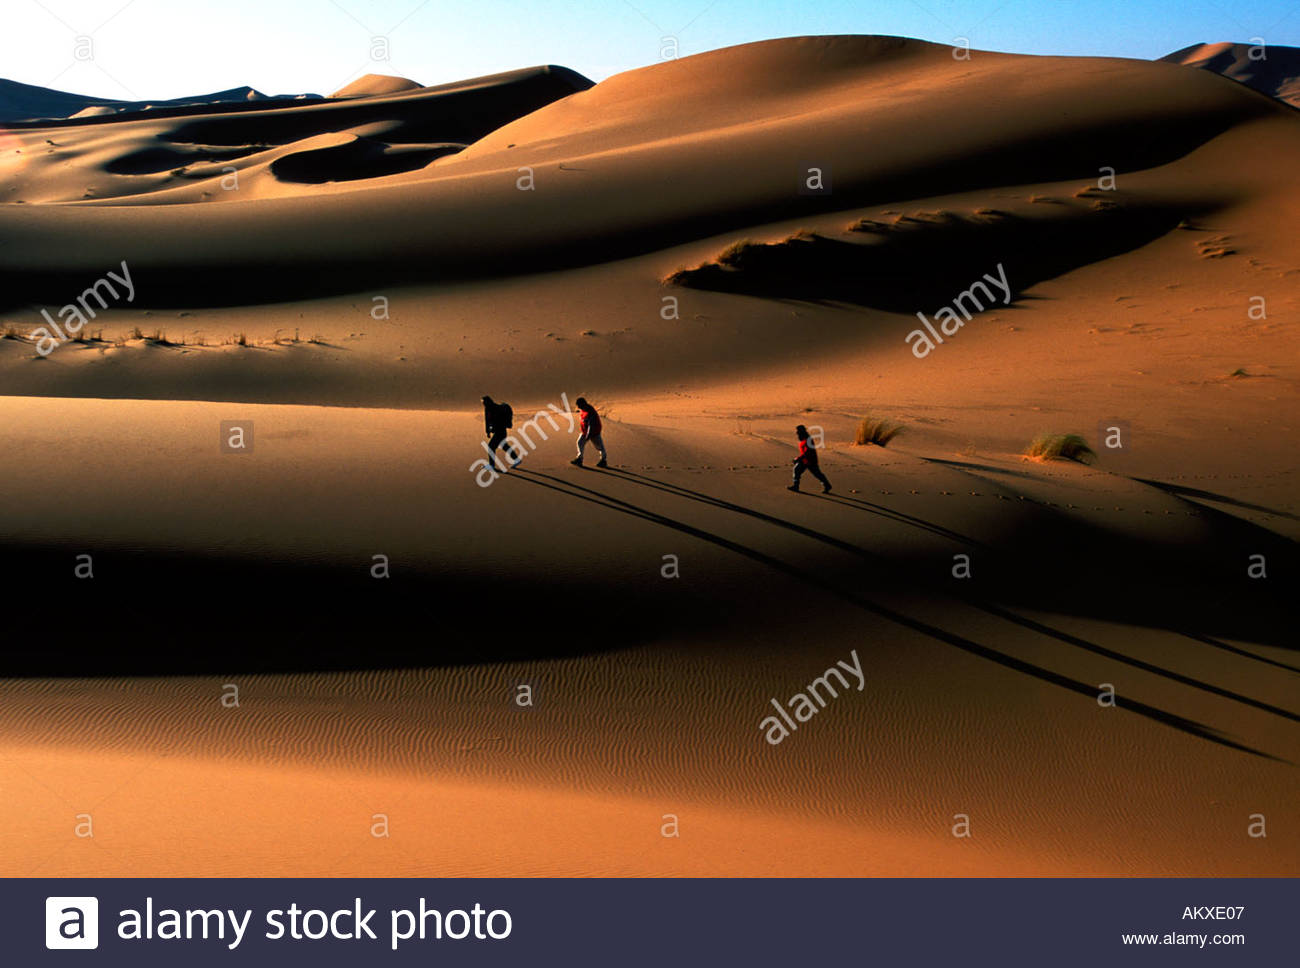 Three people trek over the sand dunes in the Sahara desert in Morocco at sunrise - Stock Image